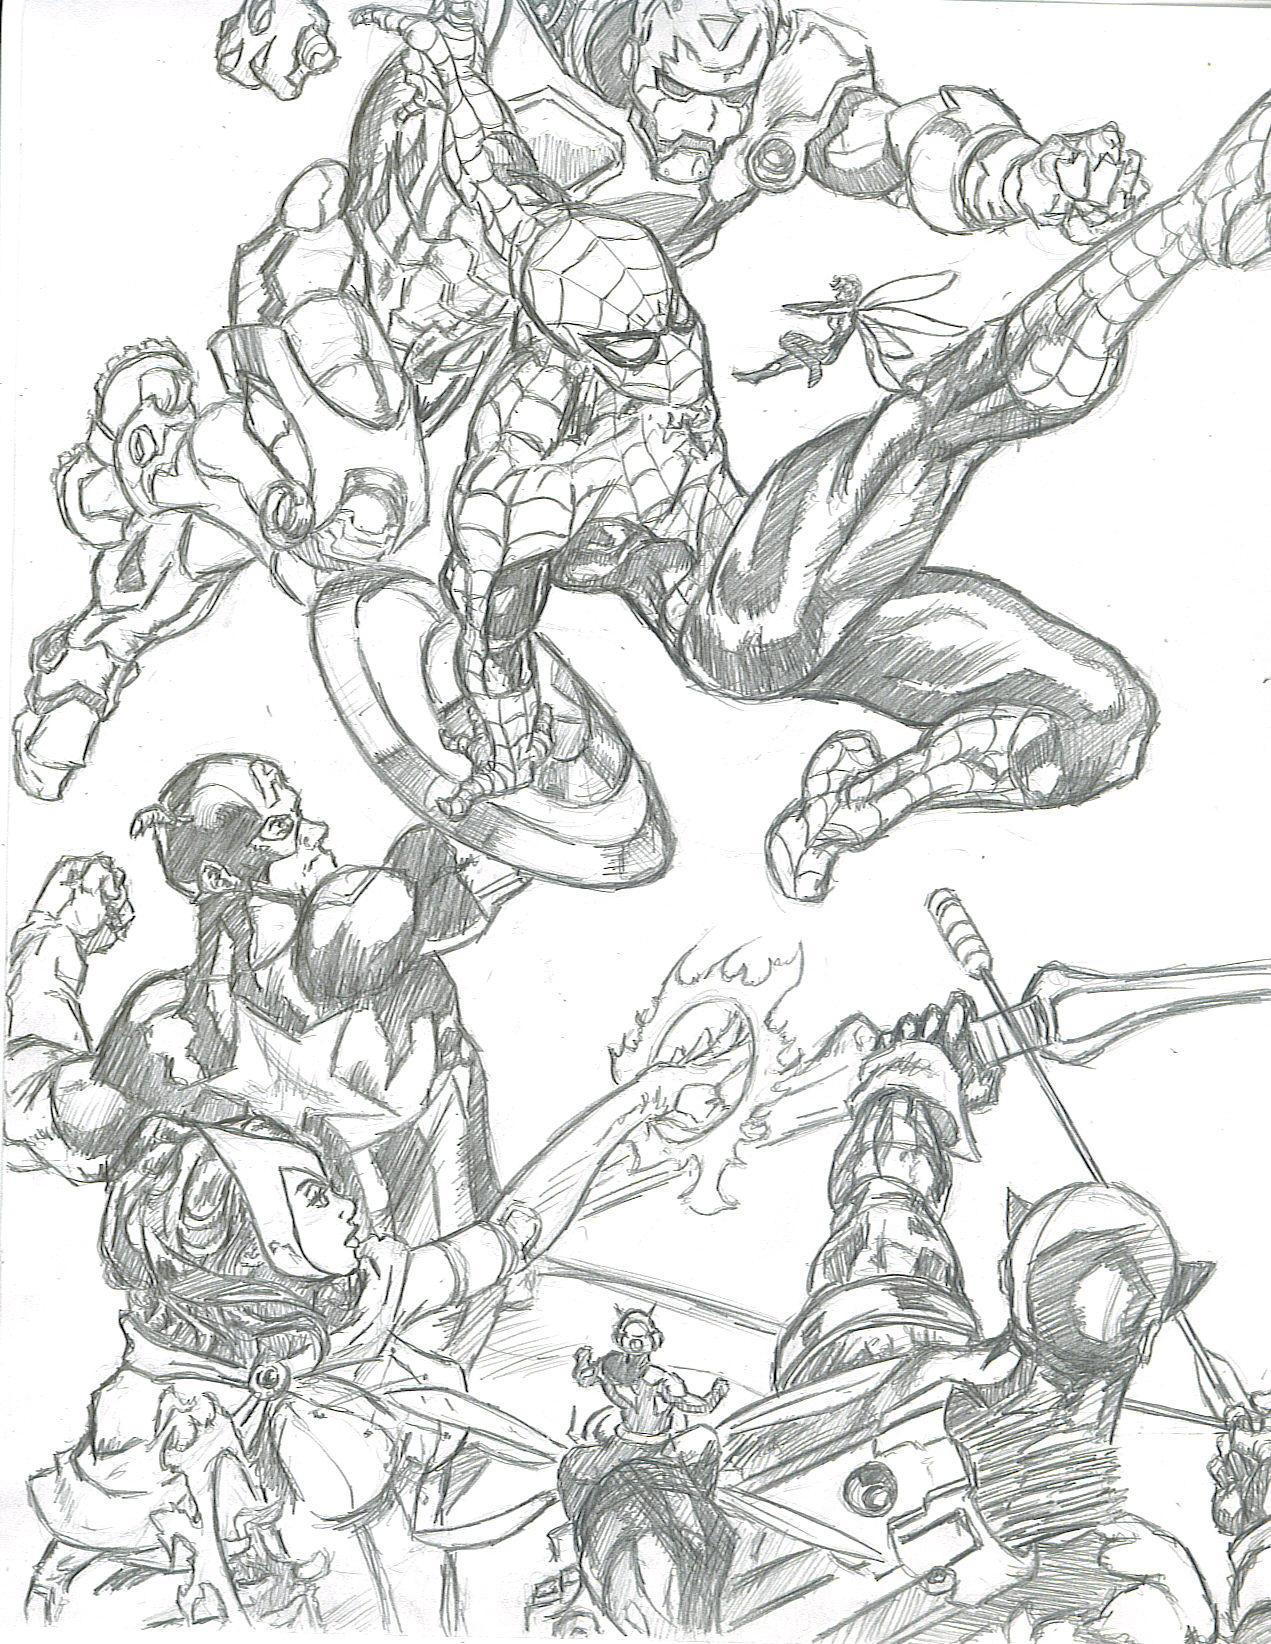 Deviantart coloring clubs - Marvel Comics Club 9 0 Spidey Vs Avengers By Kevman87